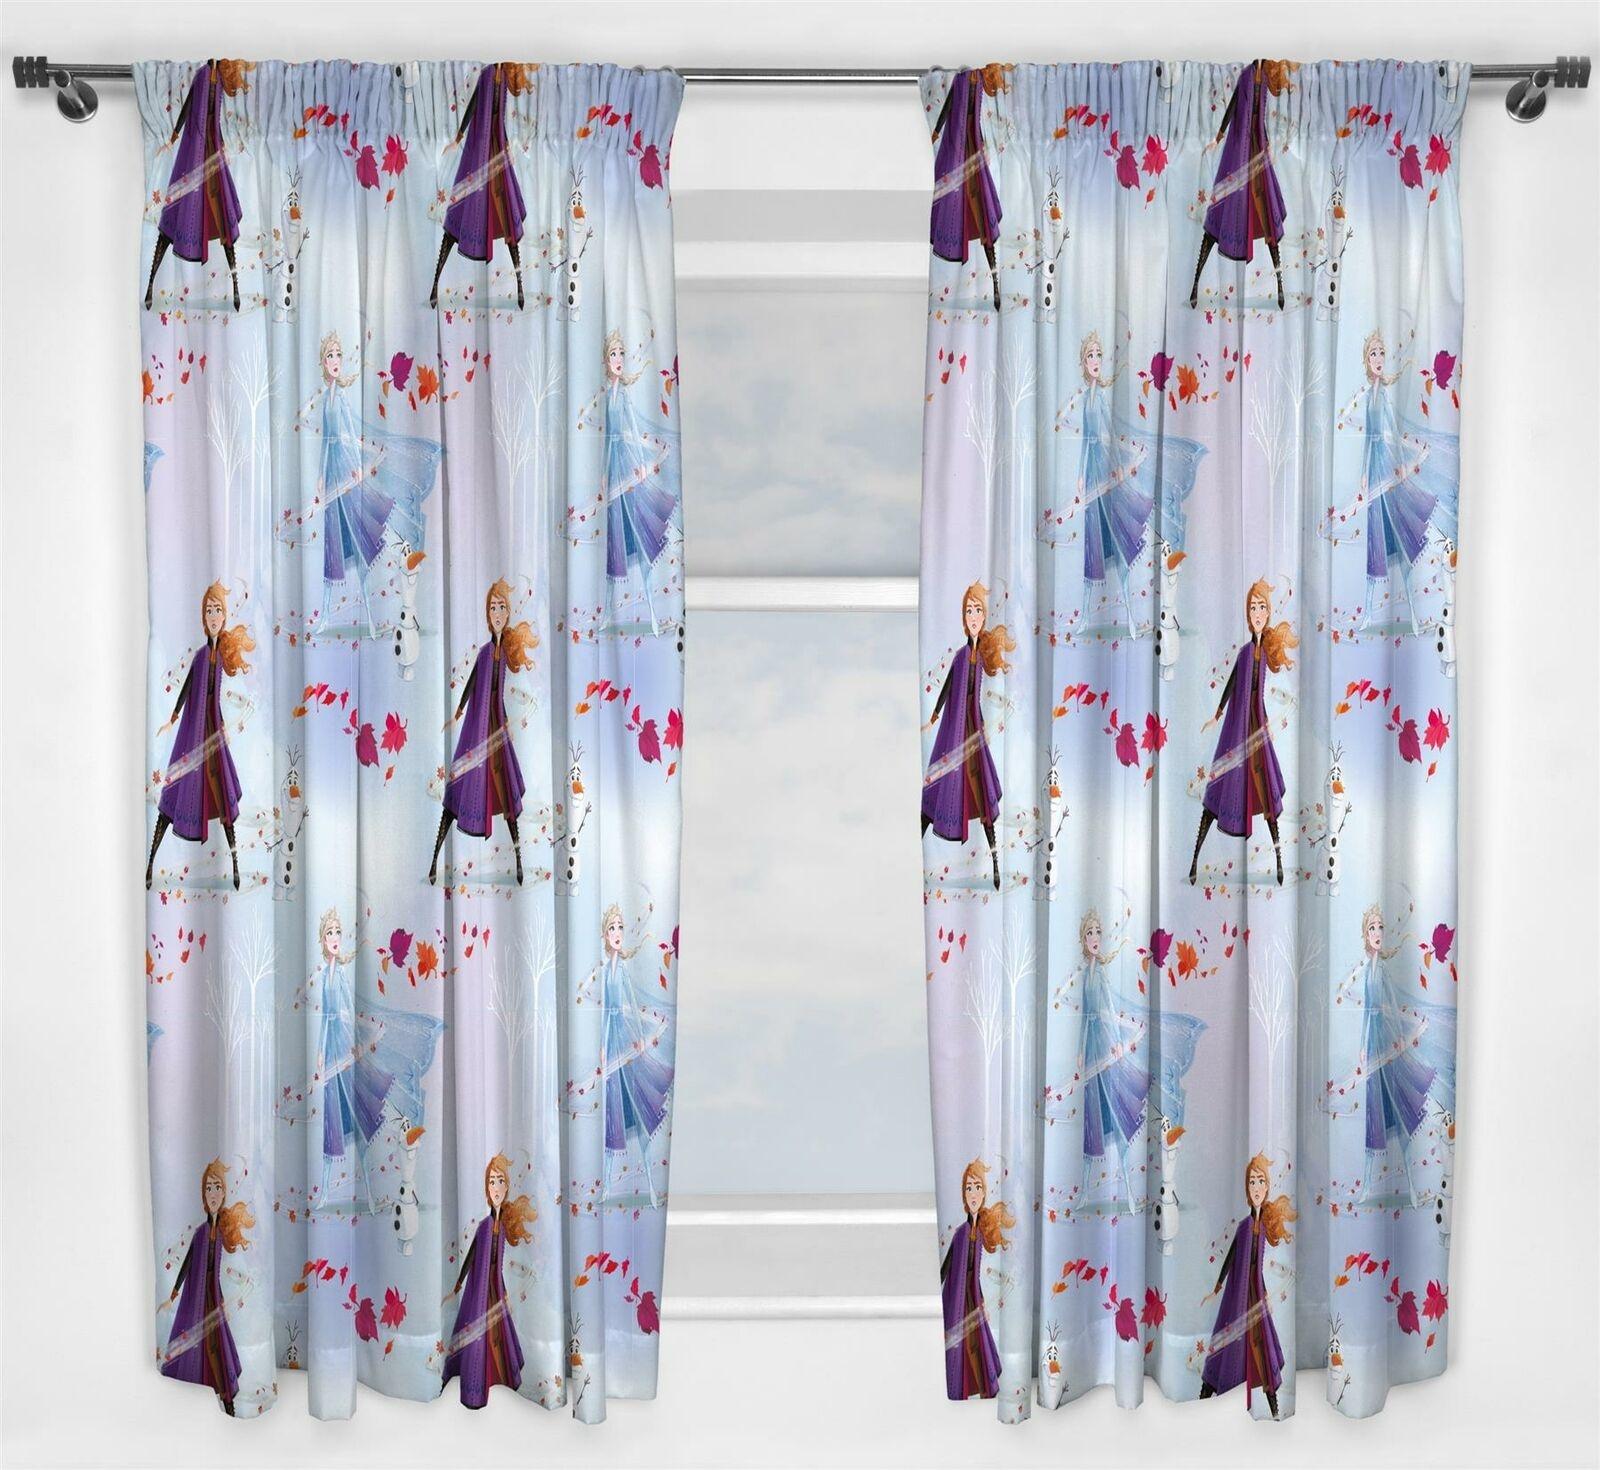 Disney Frozen Frozen 2 Curtains Element